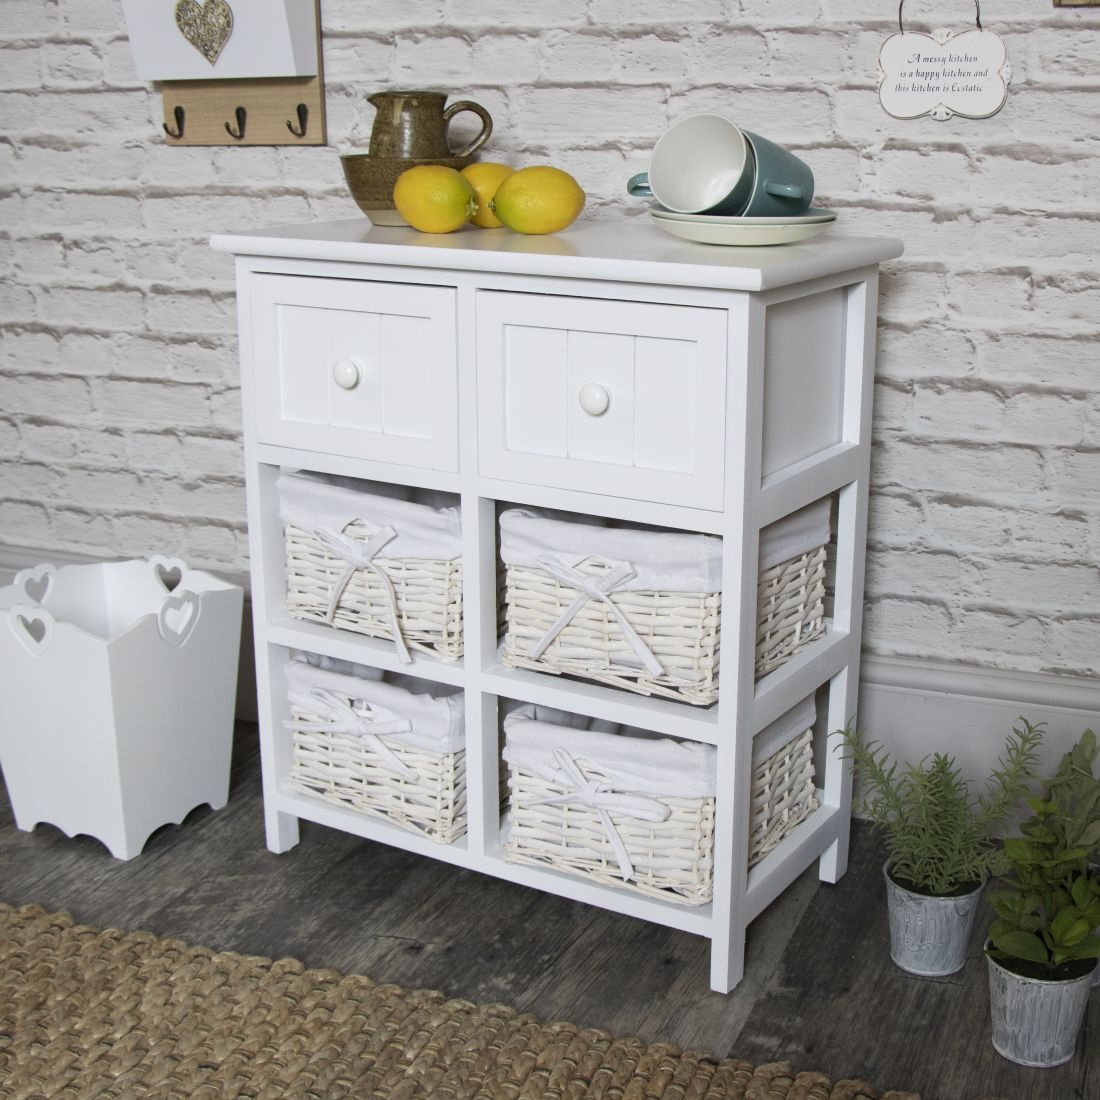 16melody-maison_2-drawers.jpg